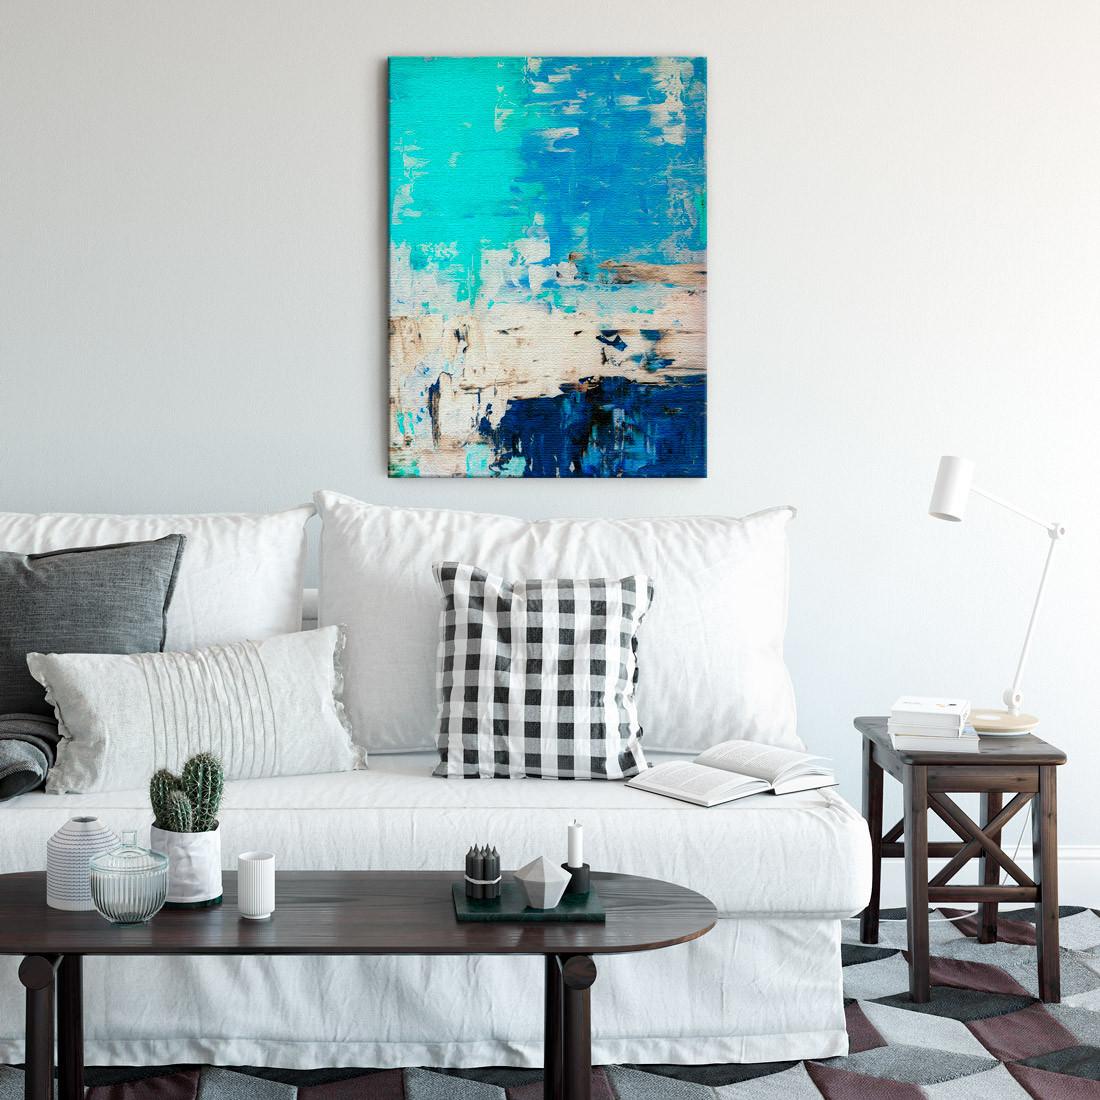 Quadro Decorativo Pintura Abstrata Azul